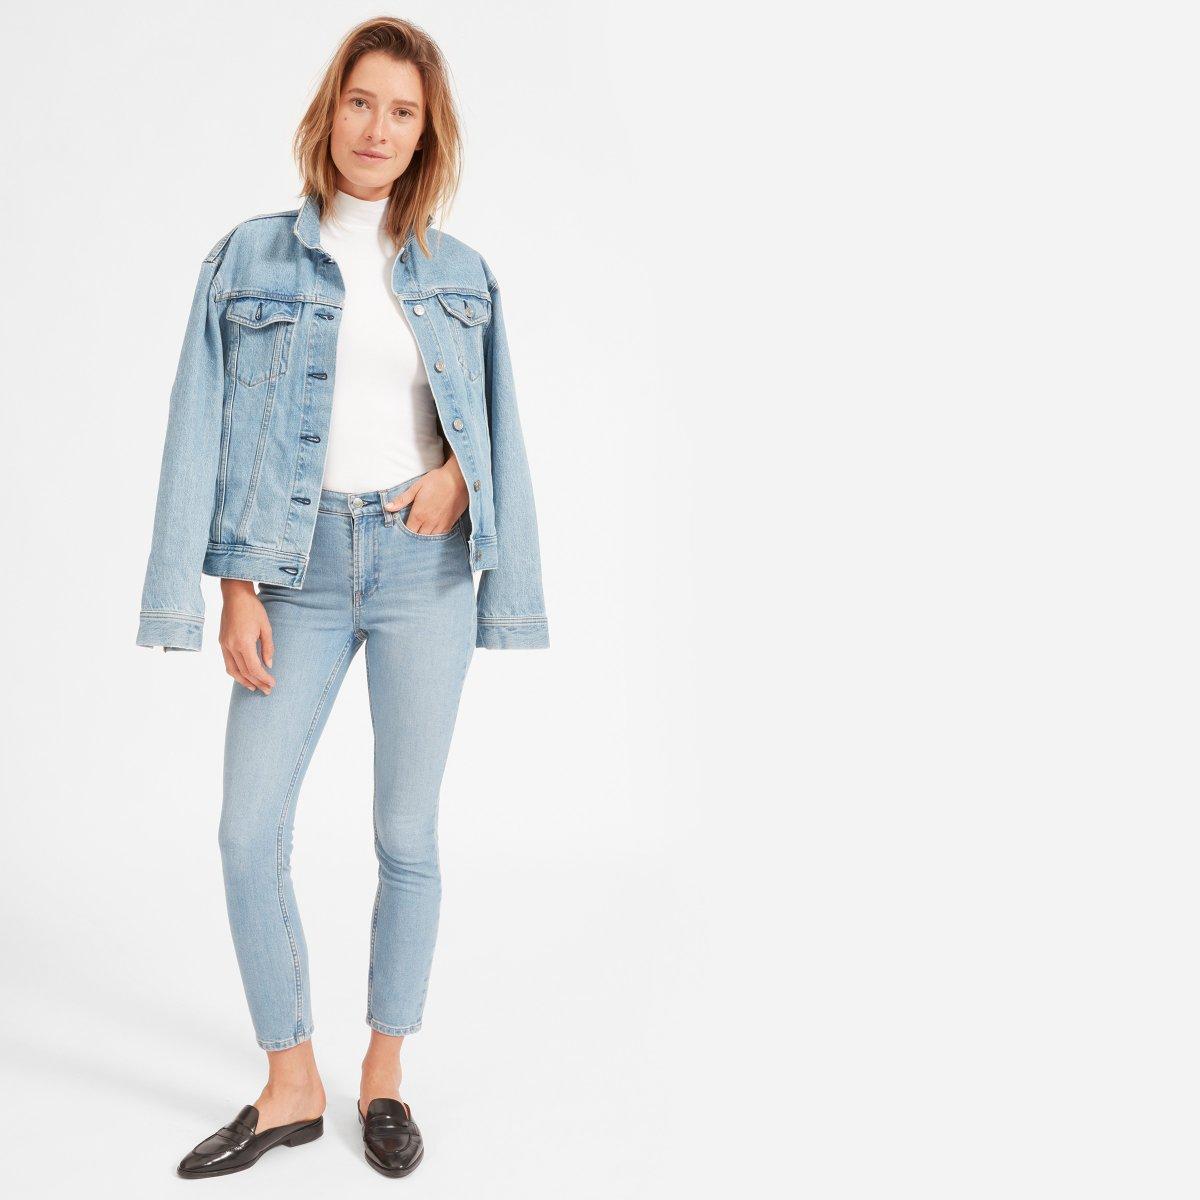 Everlane Choose What You Pay / High Rise Skinny Jean - Sunshine Style, A Florida Based Fashion Blog